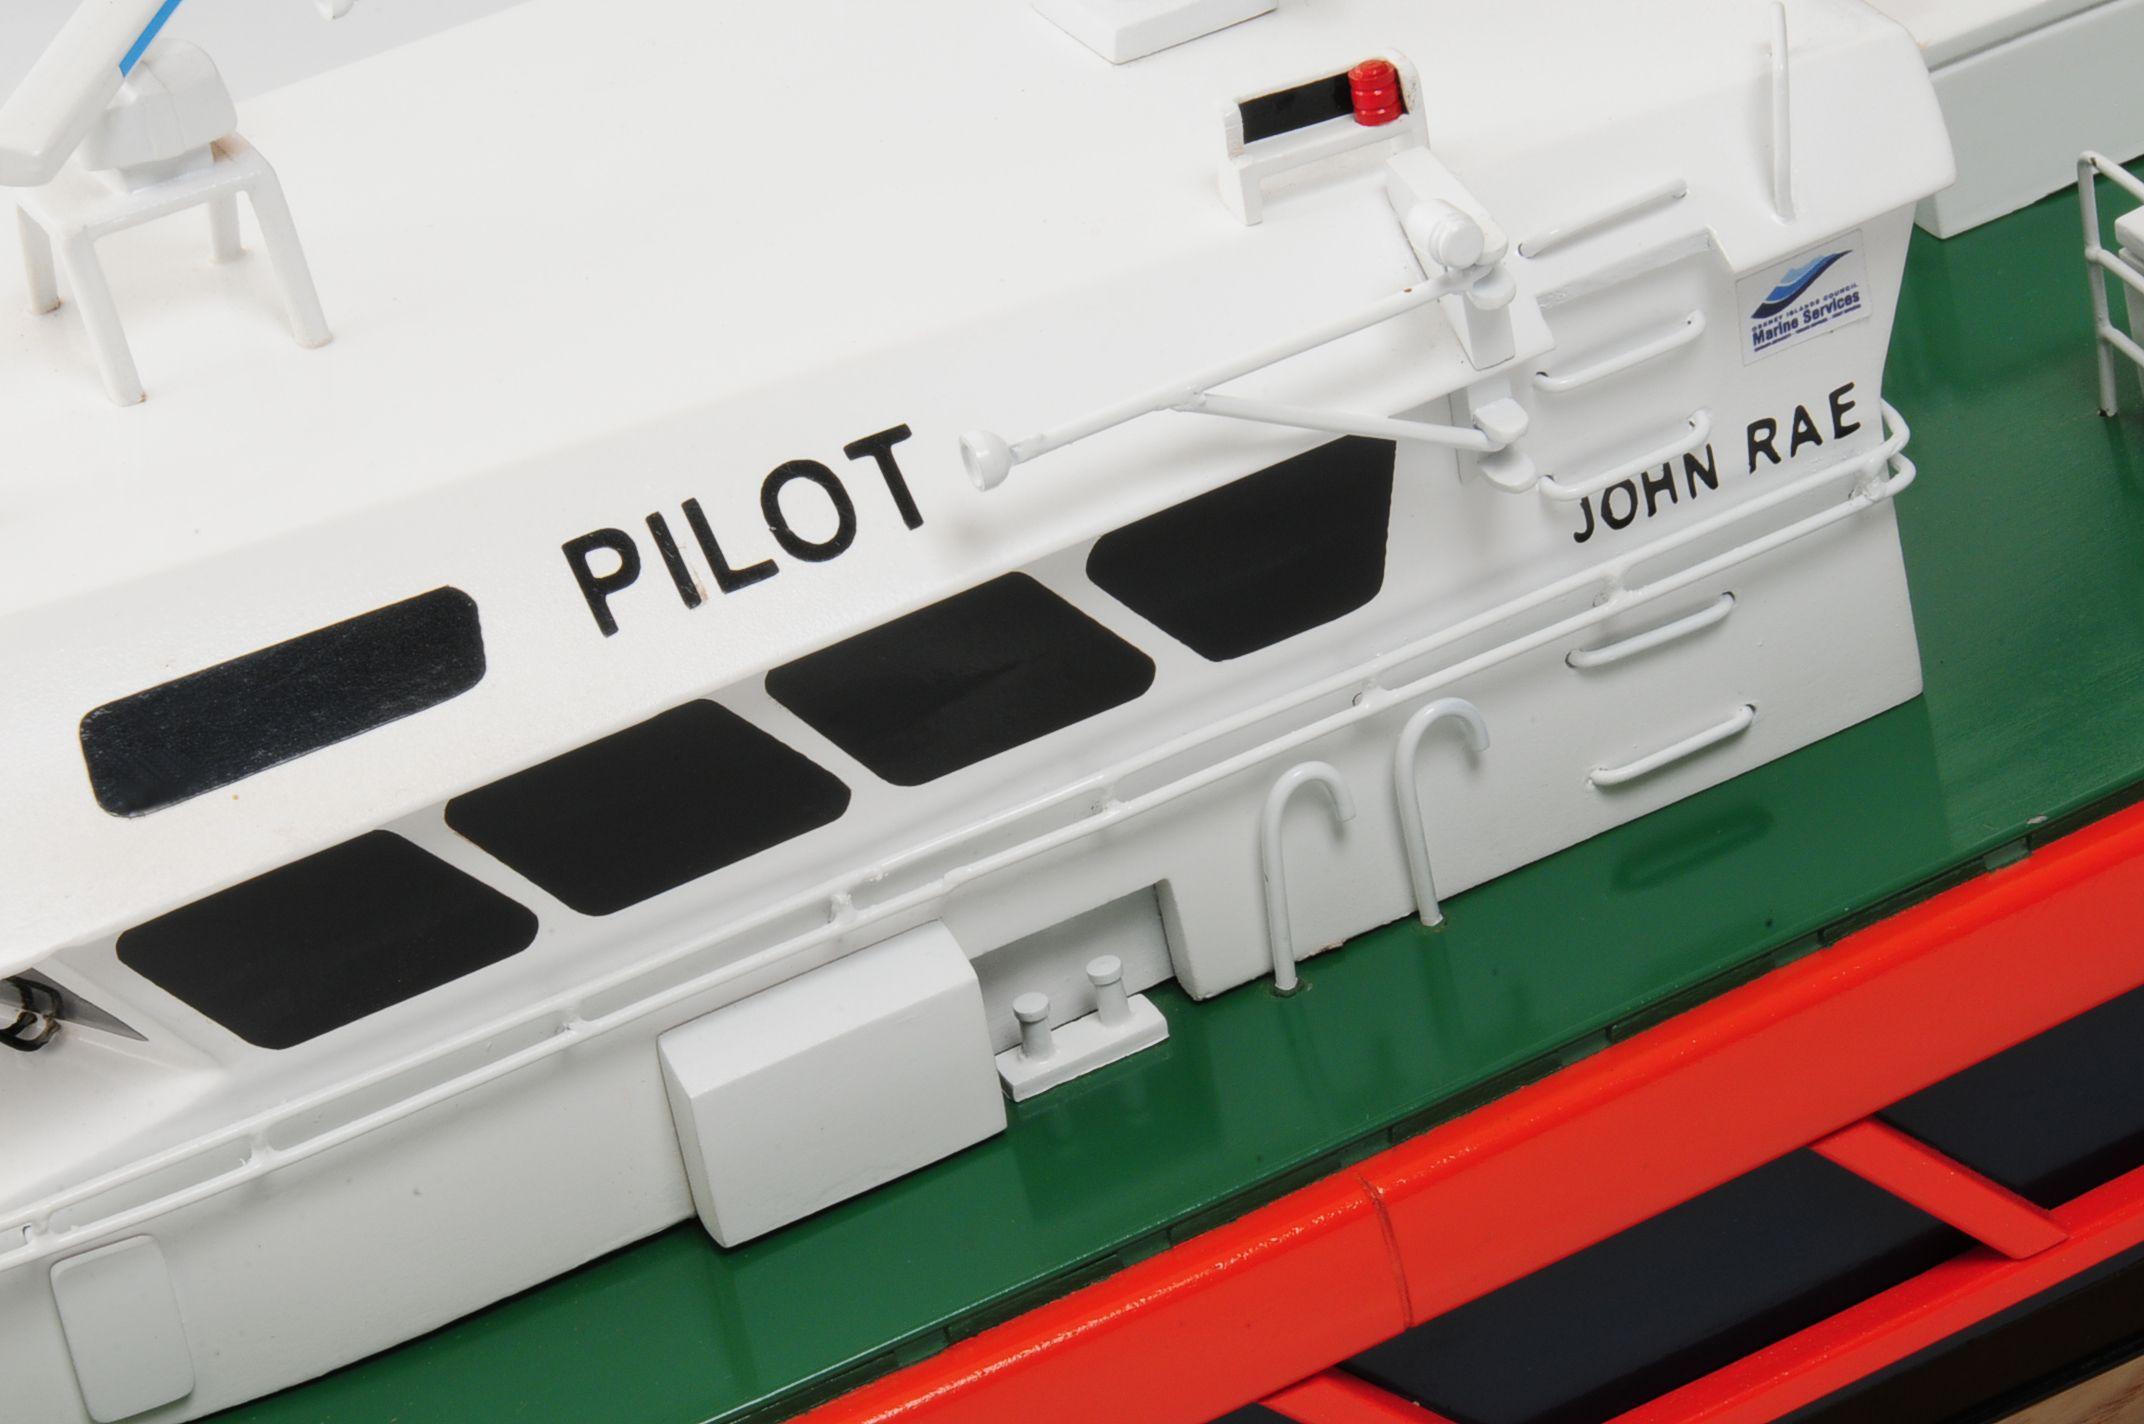 1247-6612-Orkney-Pilot-Vessel